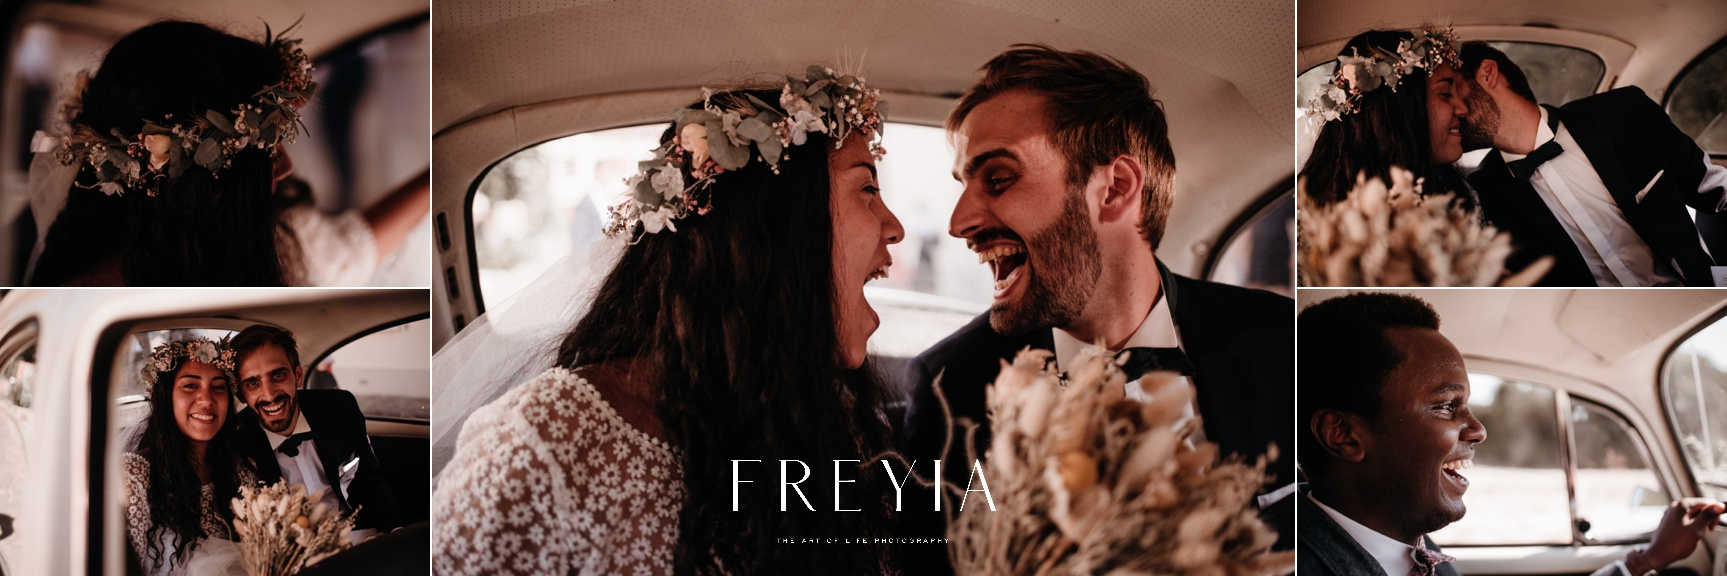 R + T |  mariage reportage alternatif moody intime minimaliste vintage naturel boho boheme |  PHOTOGRAPHE mariage PARIS france destination  | FREYIA photography_-184.jpg